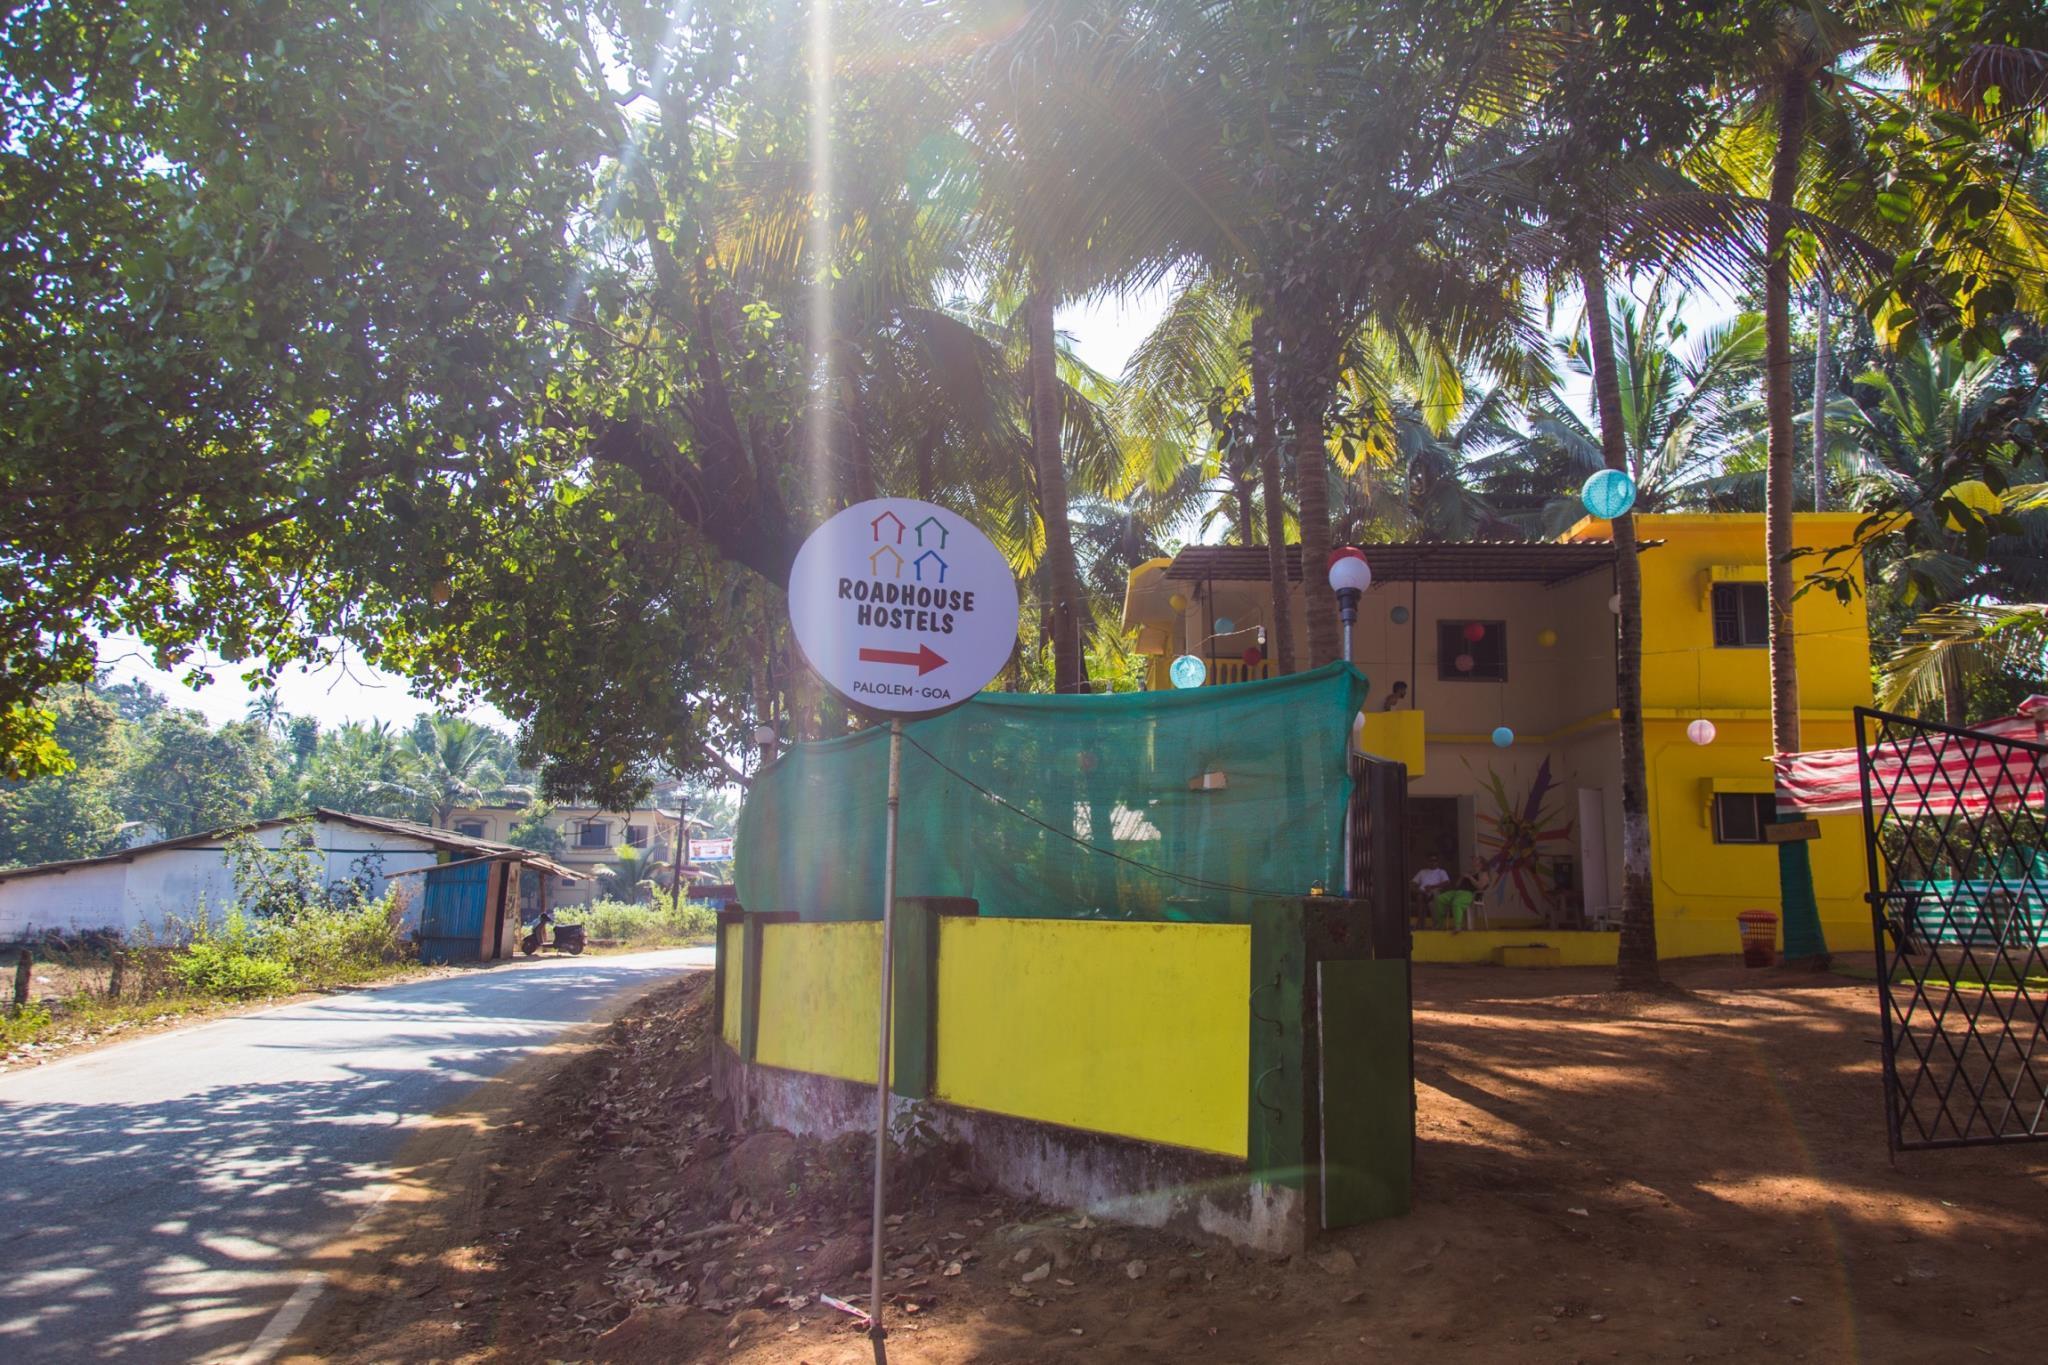 Review Roadhouse Hostels Palolem Goa